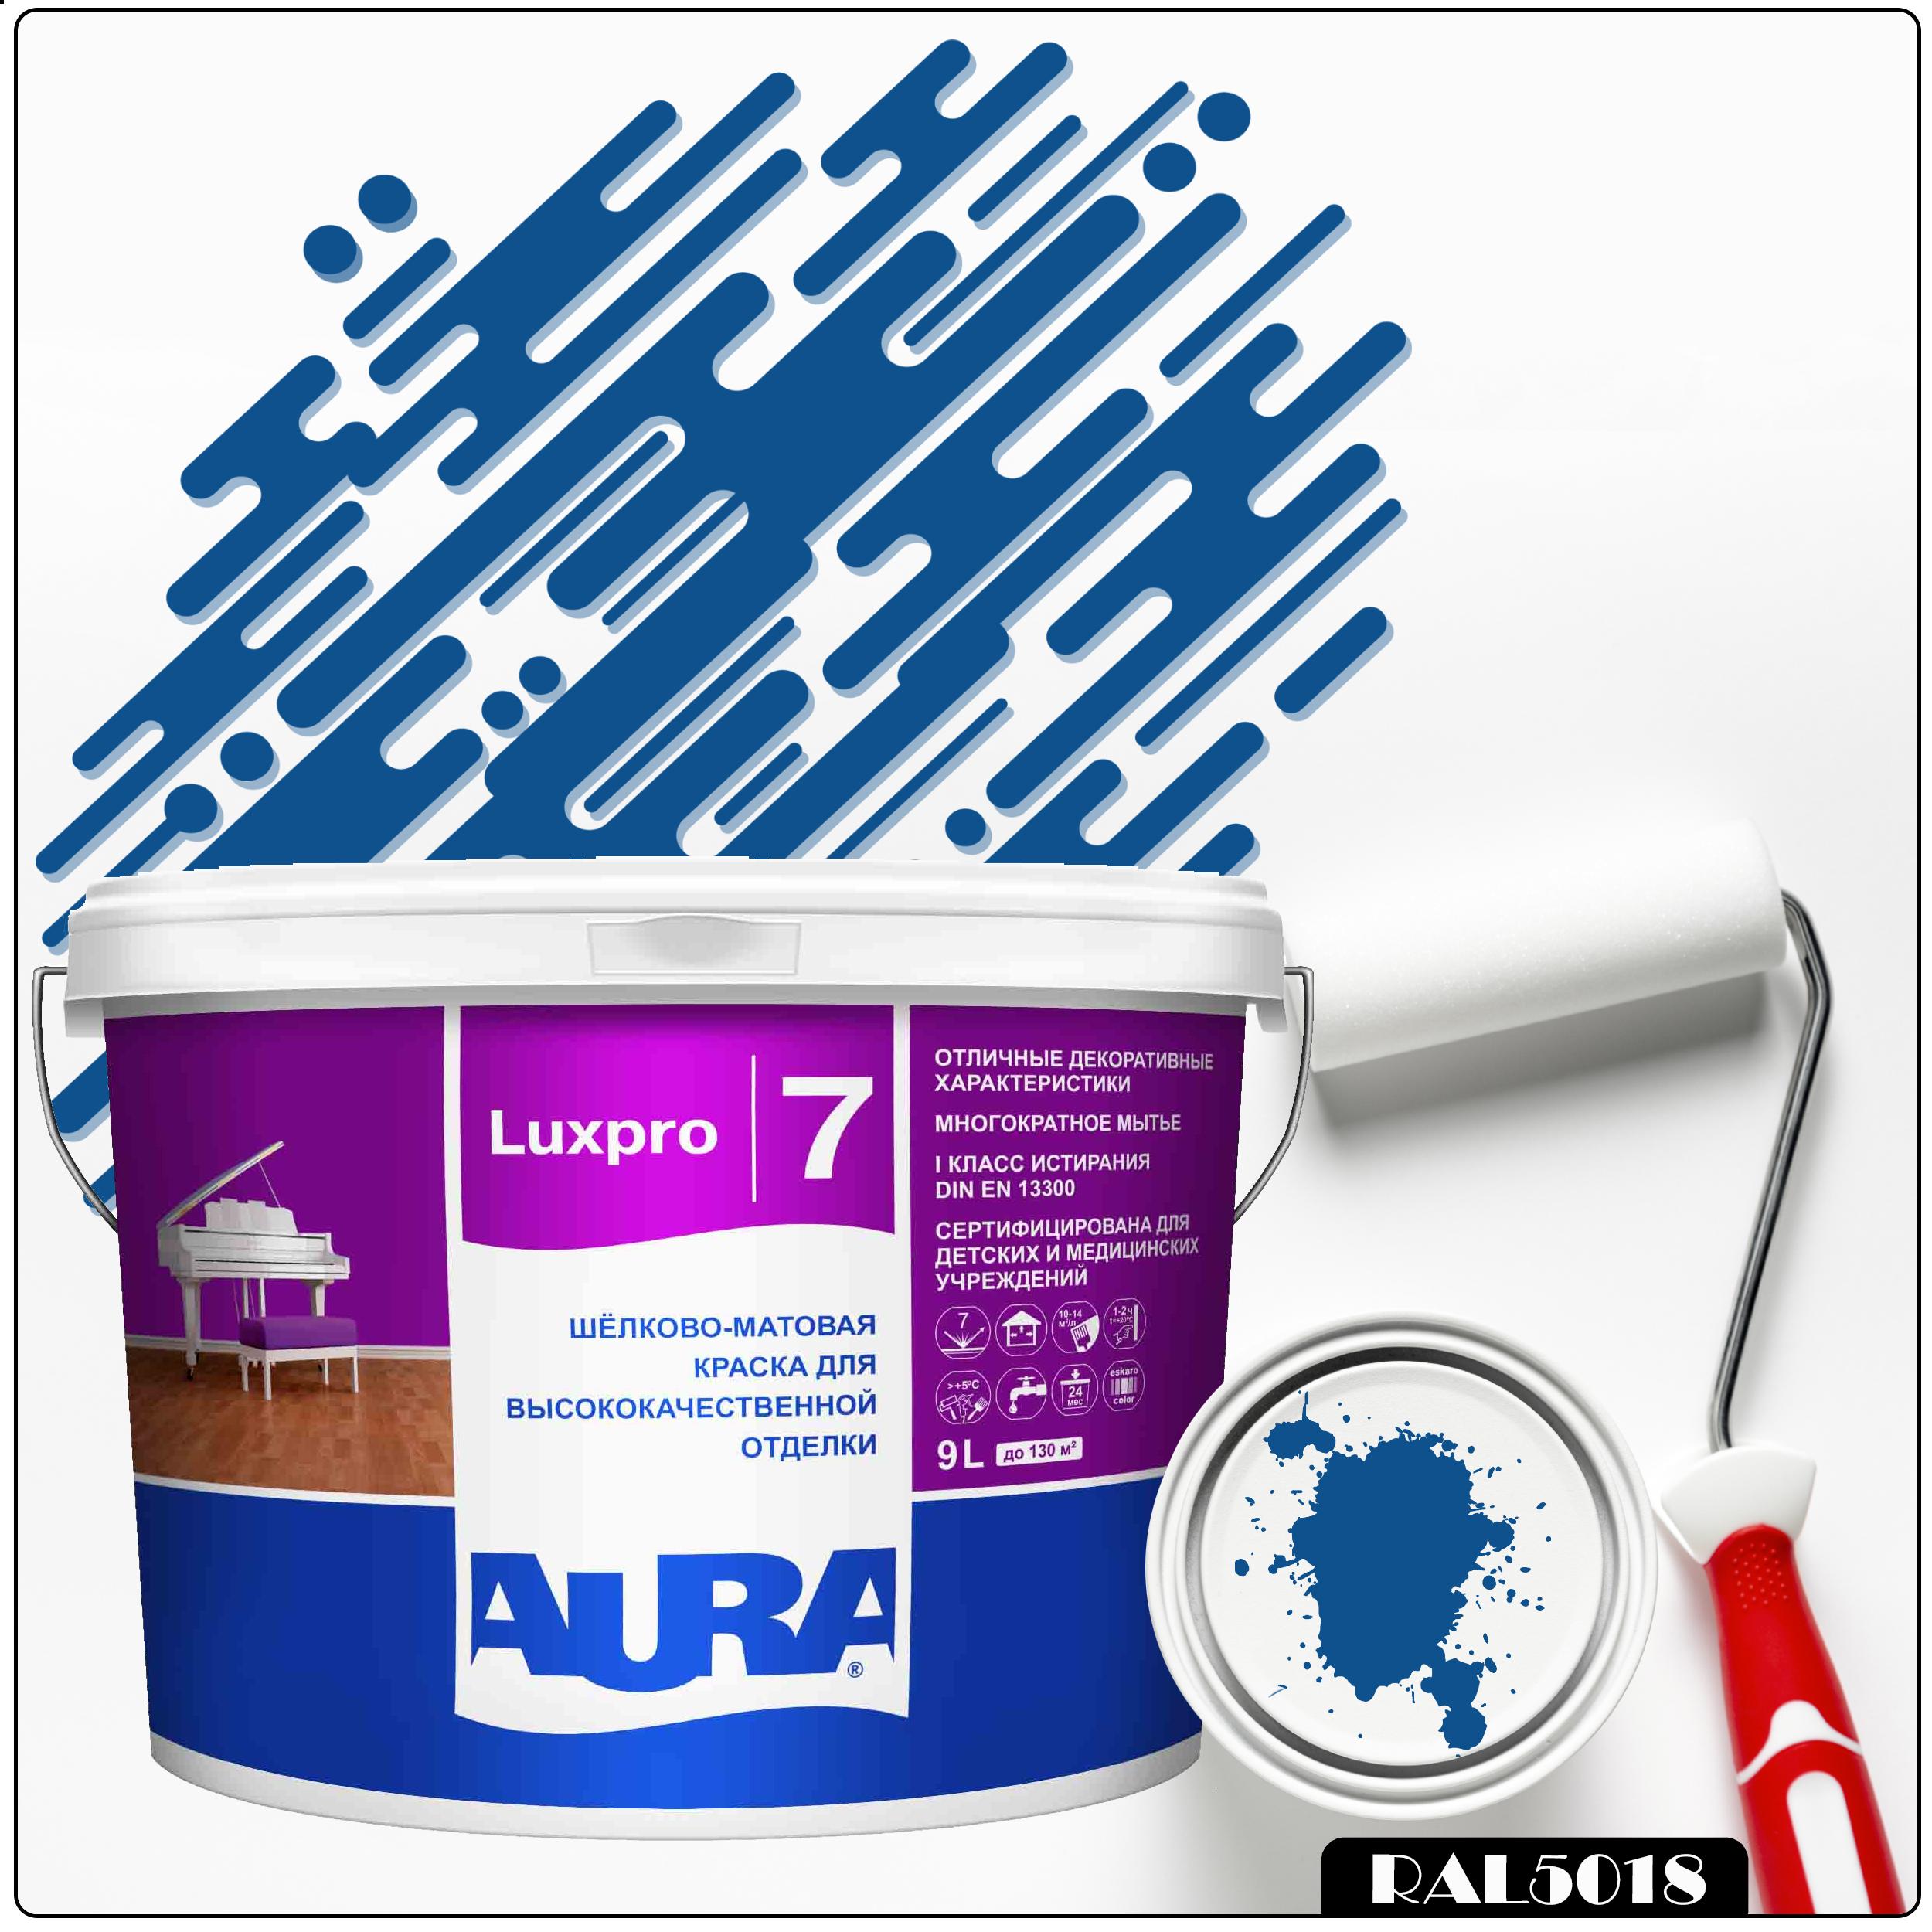 Фото 17 - Краска Aura LuxPRO 7, RAL 5018 Бирюзово-синий, латексная, шелково-матовая, интерьерная, 9л, Аура.